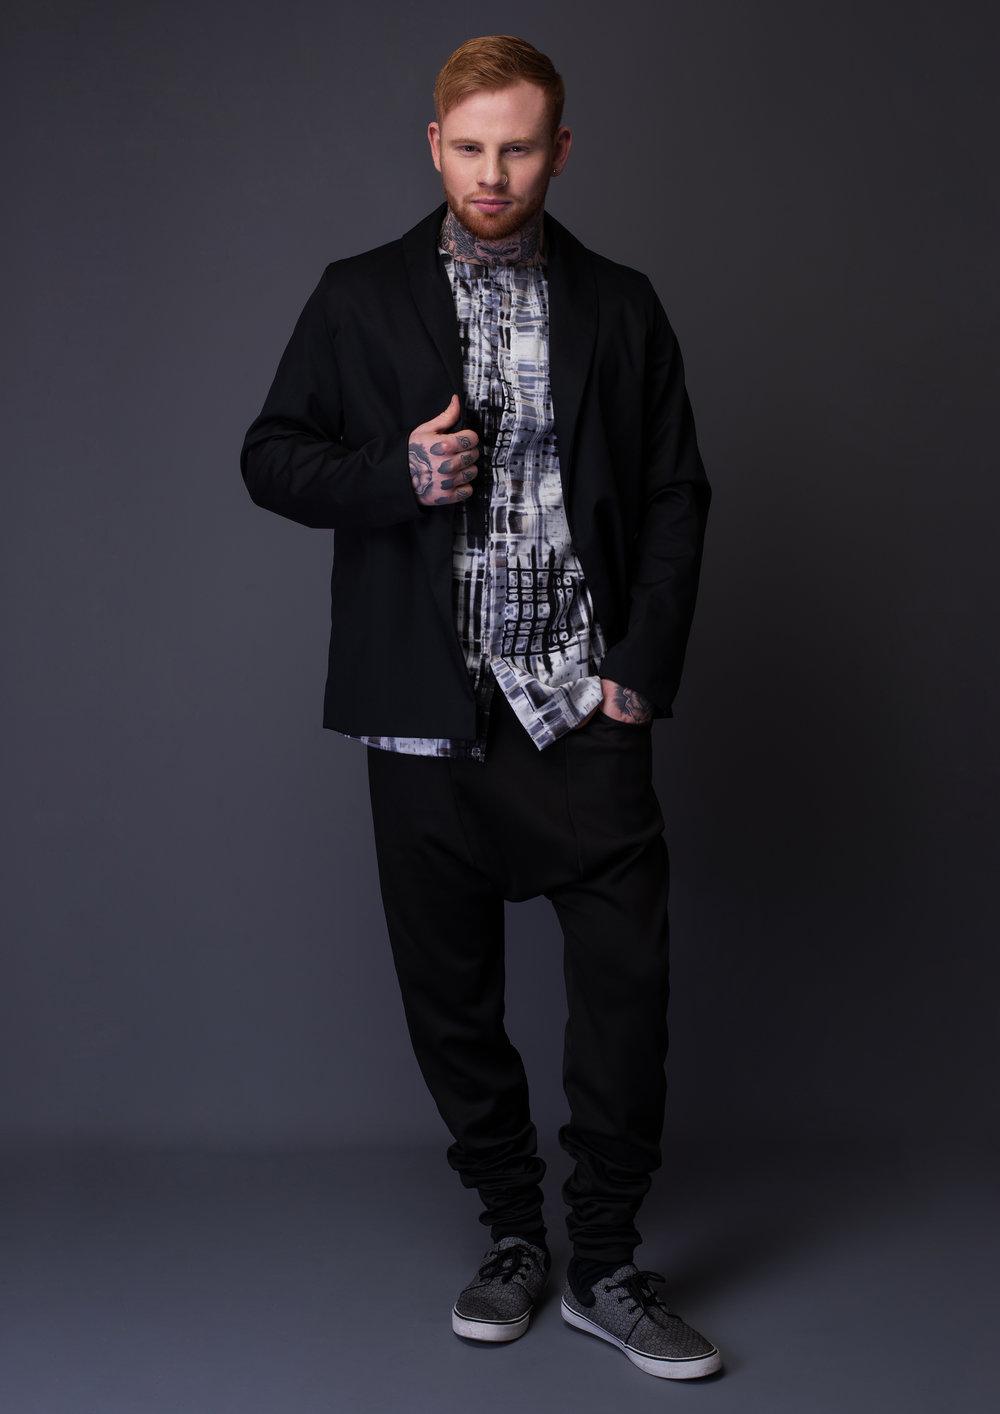 zaramia-ava-zaramiaava-leeds-fashion-designer-leedsfashiondesigner-stylist-leeds-stylist-leedsstylist-ethical-sustainable-minimalist-versatile-drape-eito-hareem-trouser-pants-black-ren-akiro-11